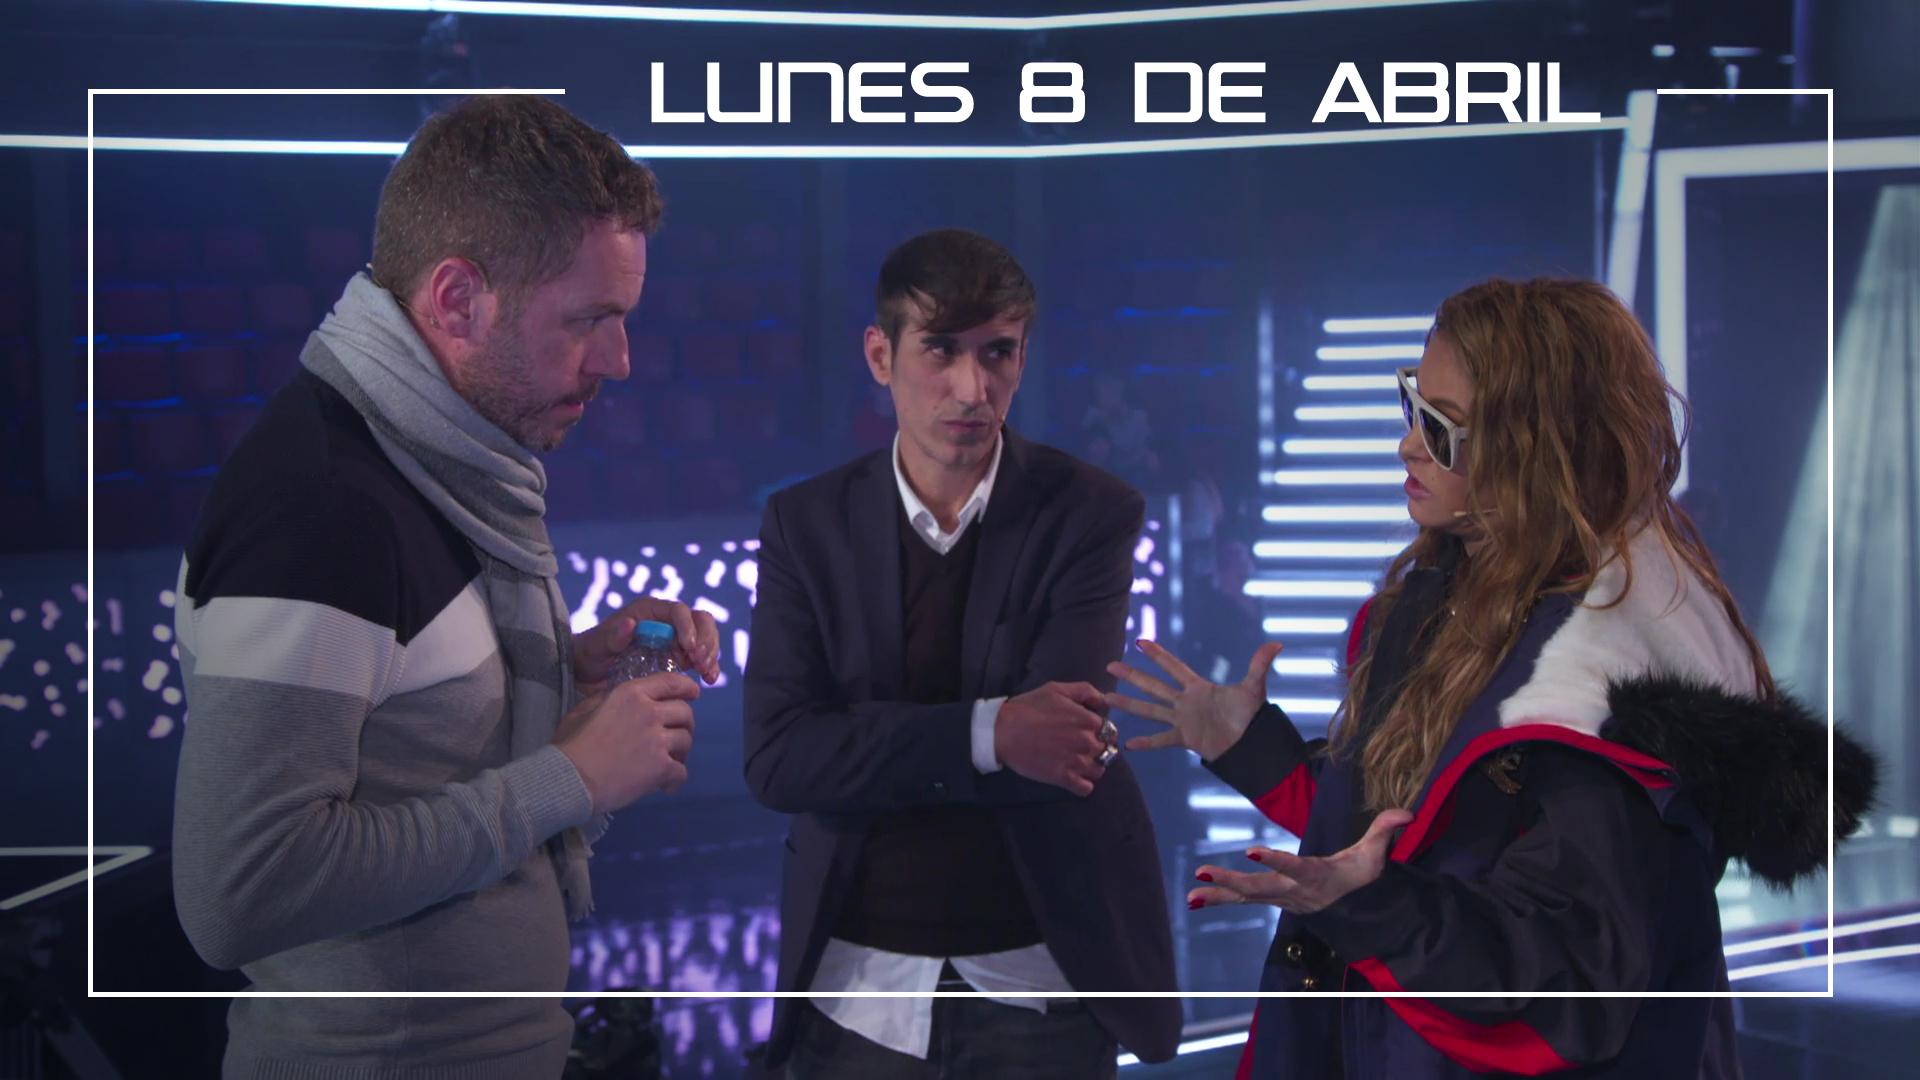 Lunes 8 de abril Ángel Cortés ensaya con Paulina Rubio en plató 'Unchained melody'